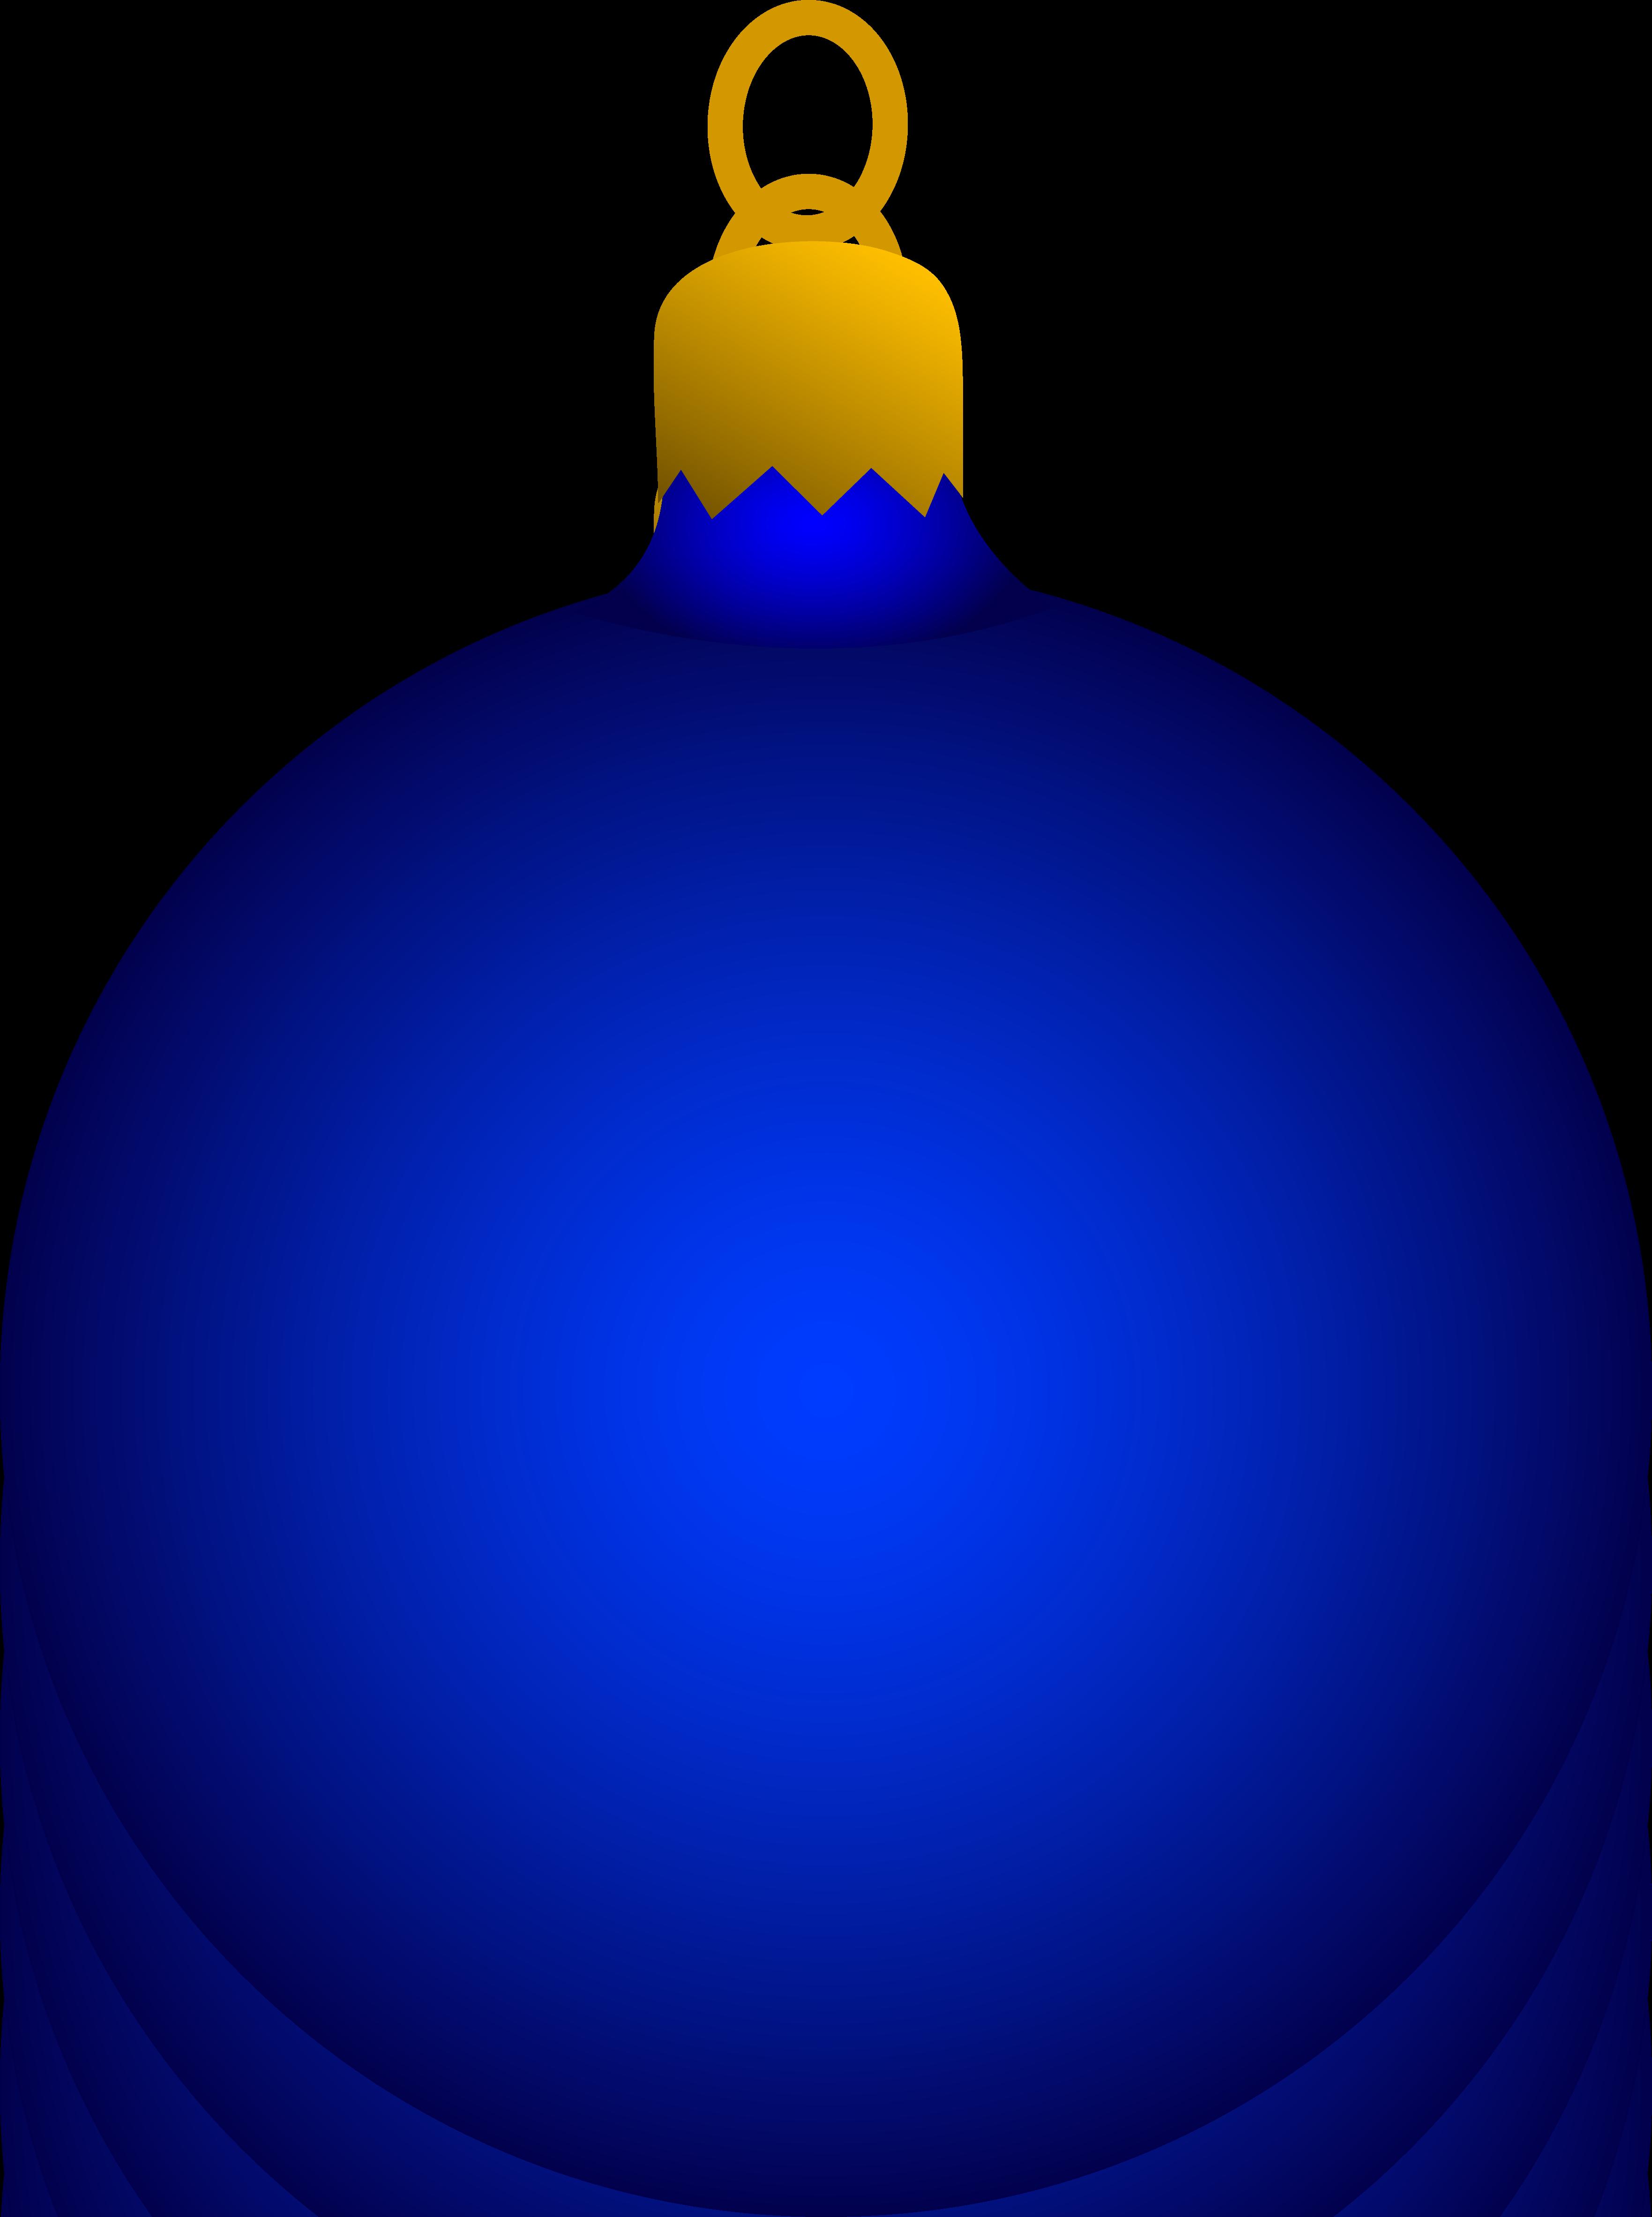 png Ornament clipart. Blue